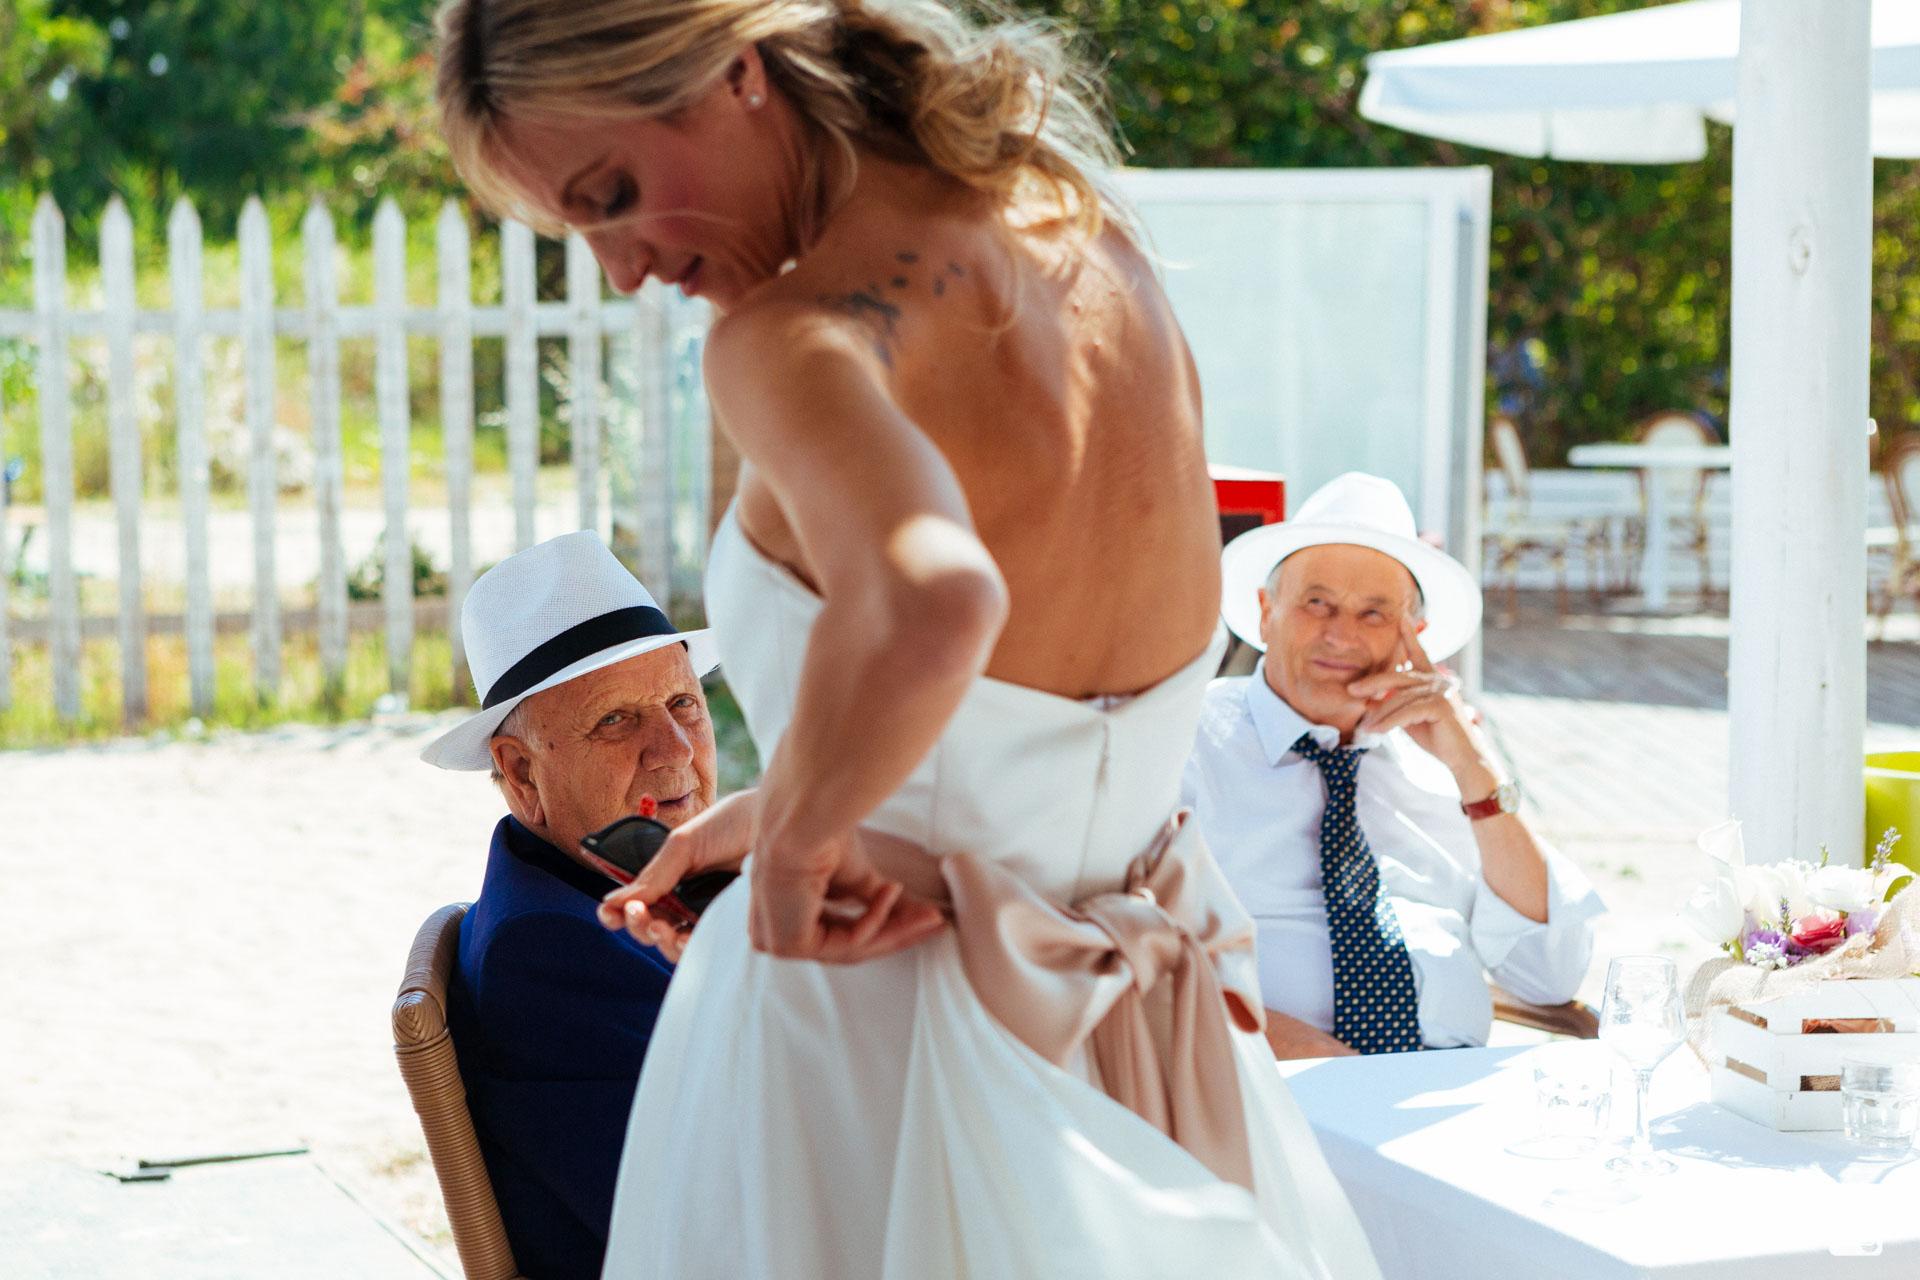 wedding_in_marzamemi-41.jpg